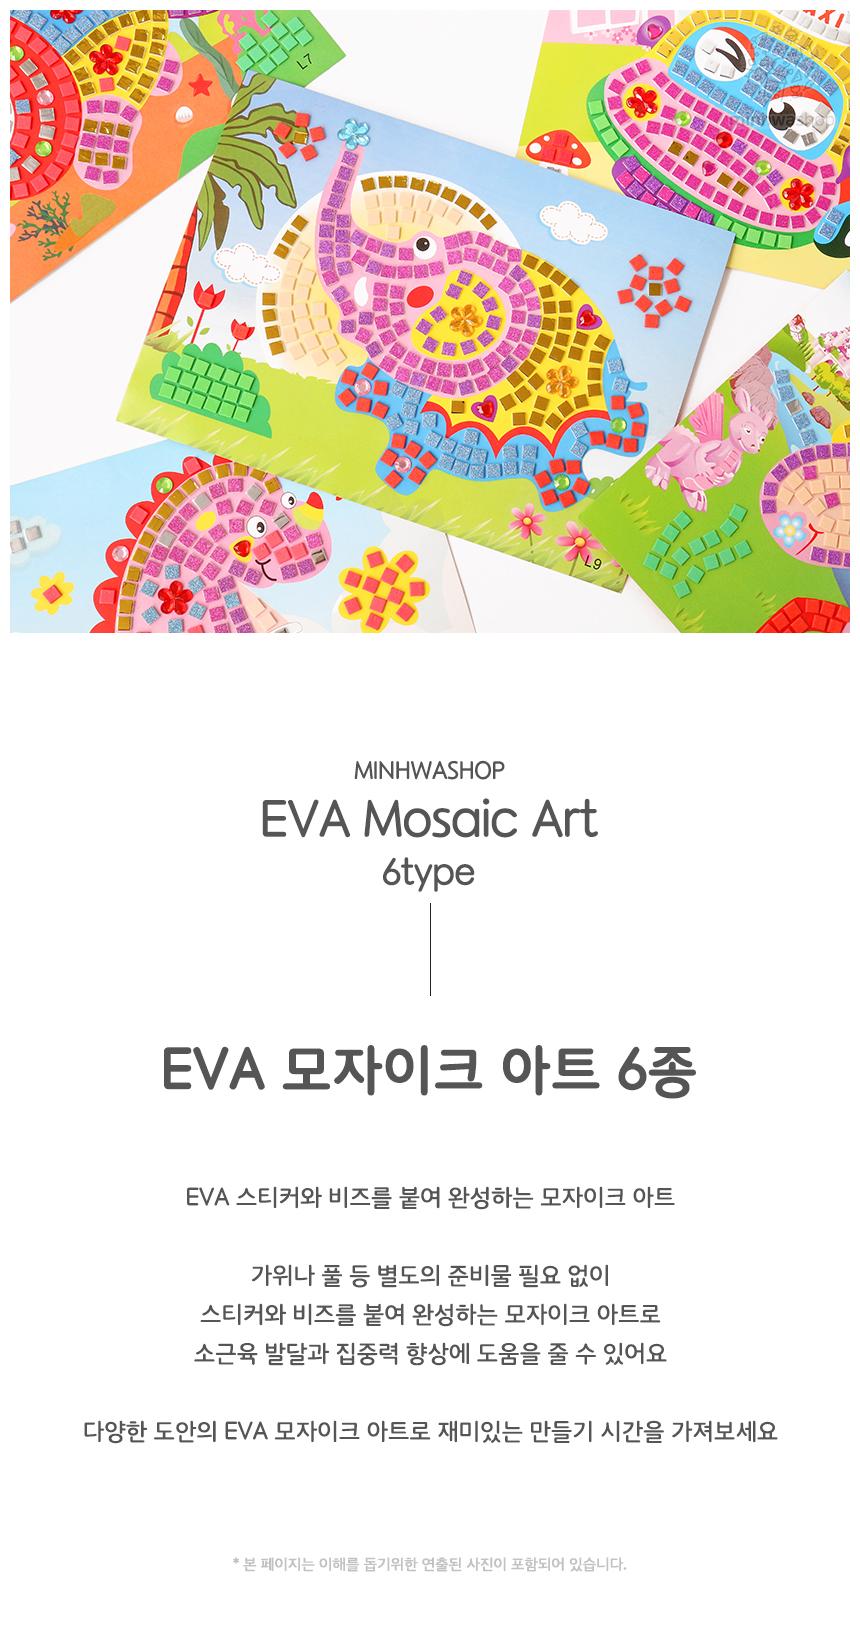 EVA모자이크